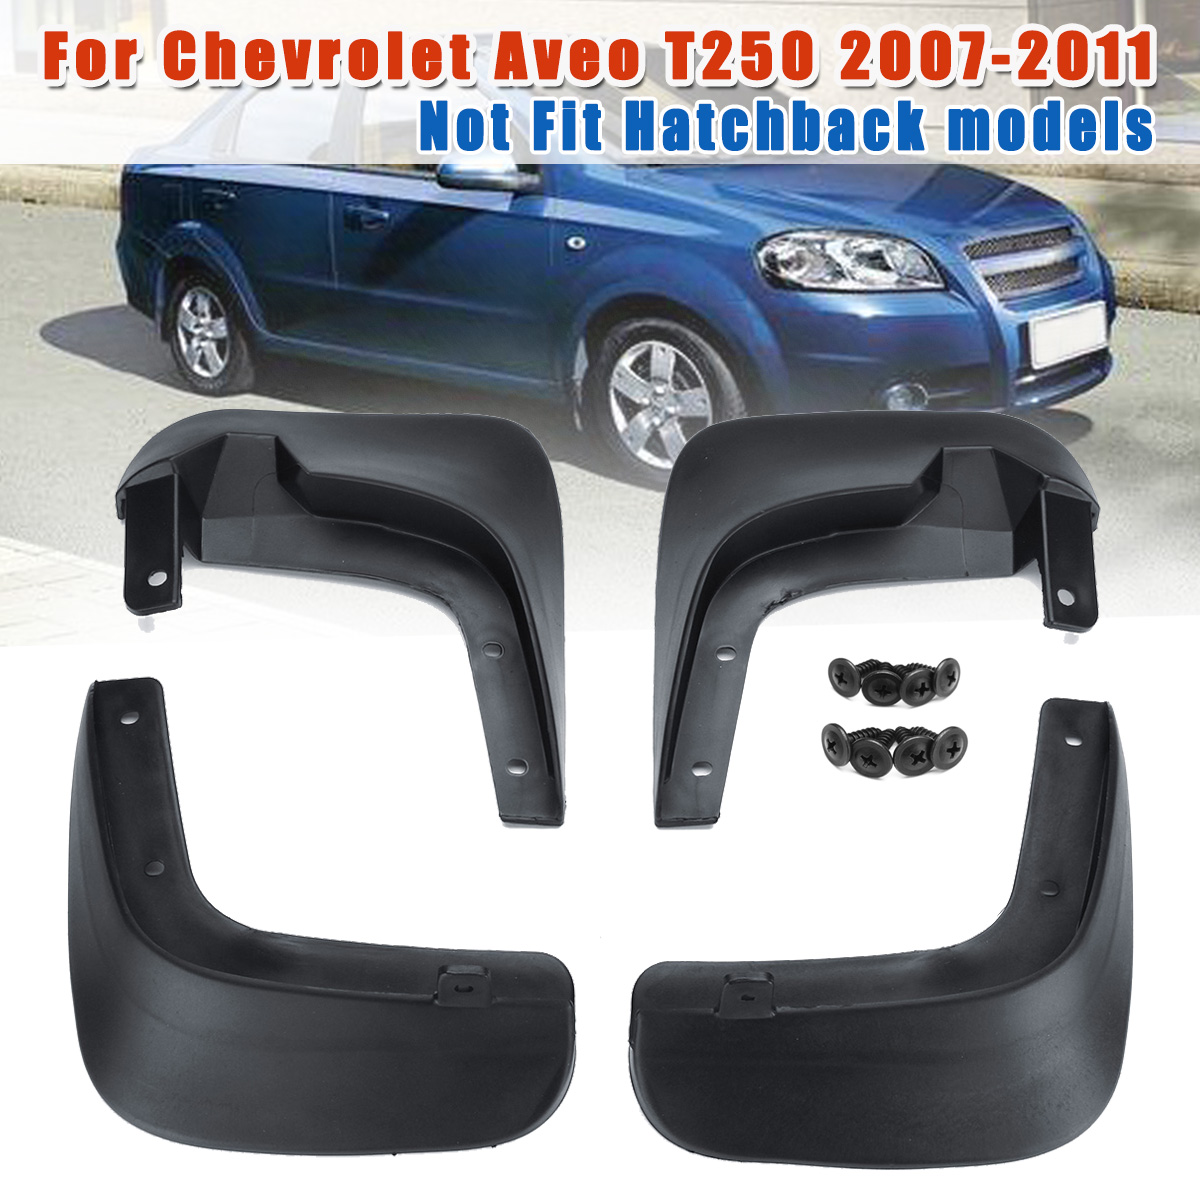 Para Chevrolet Aveo T250 2007, 2008, 2009, 2010, 2011 guardabarros de coche frente luces de guardabarros trasero Auto guardabarros protector contra salpicaduras